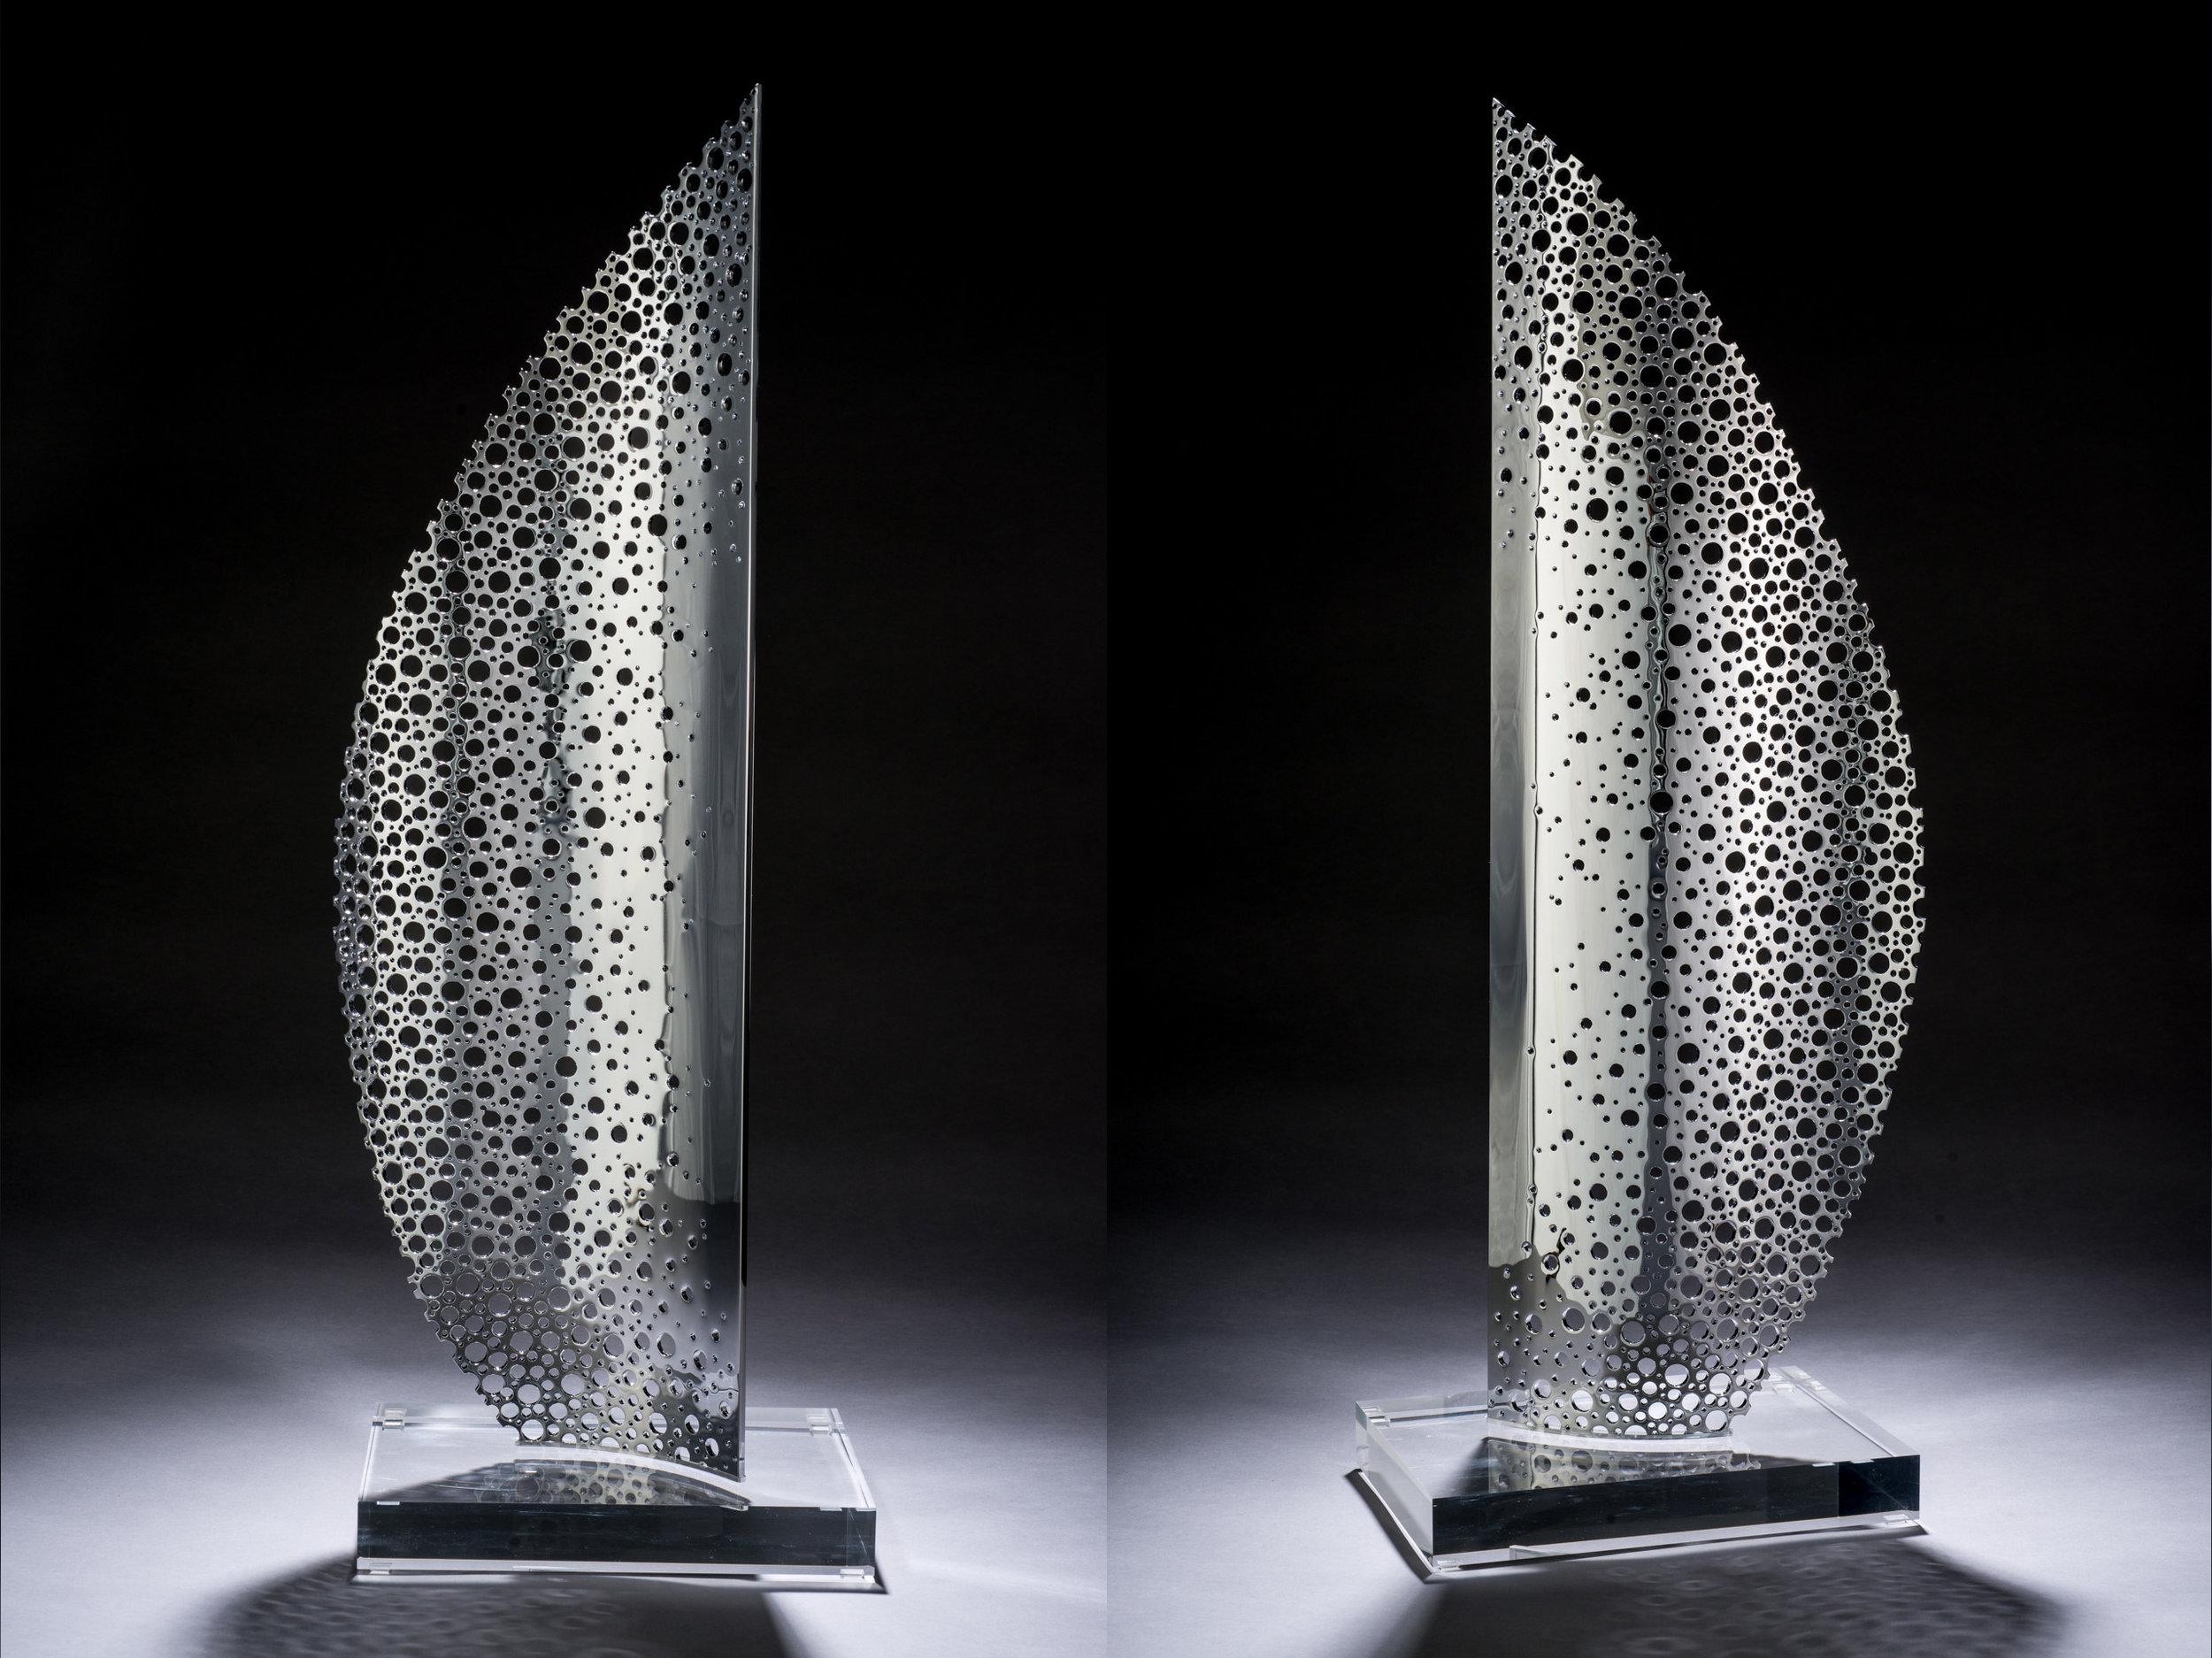 Copy of Mirror Mast II